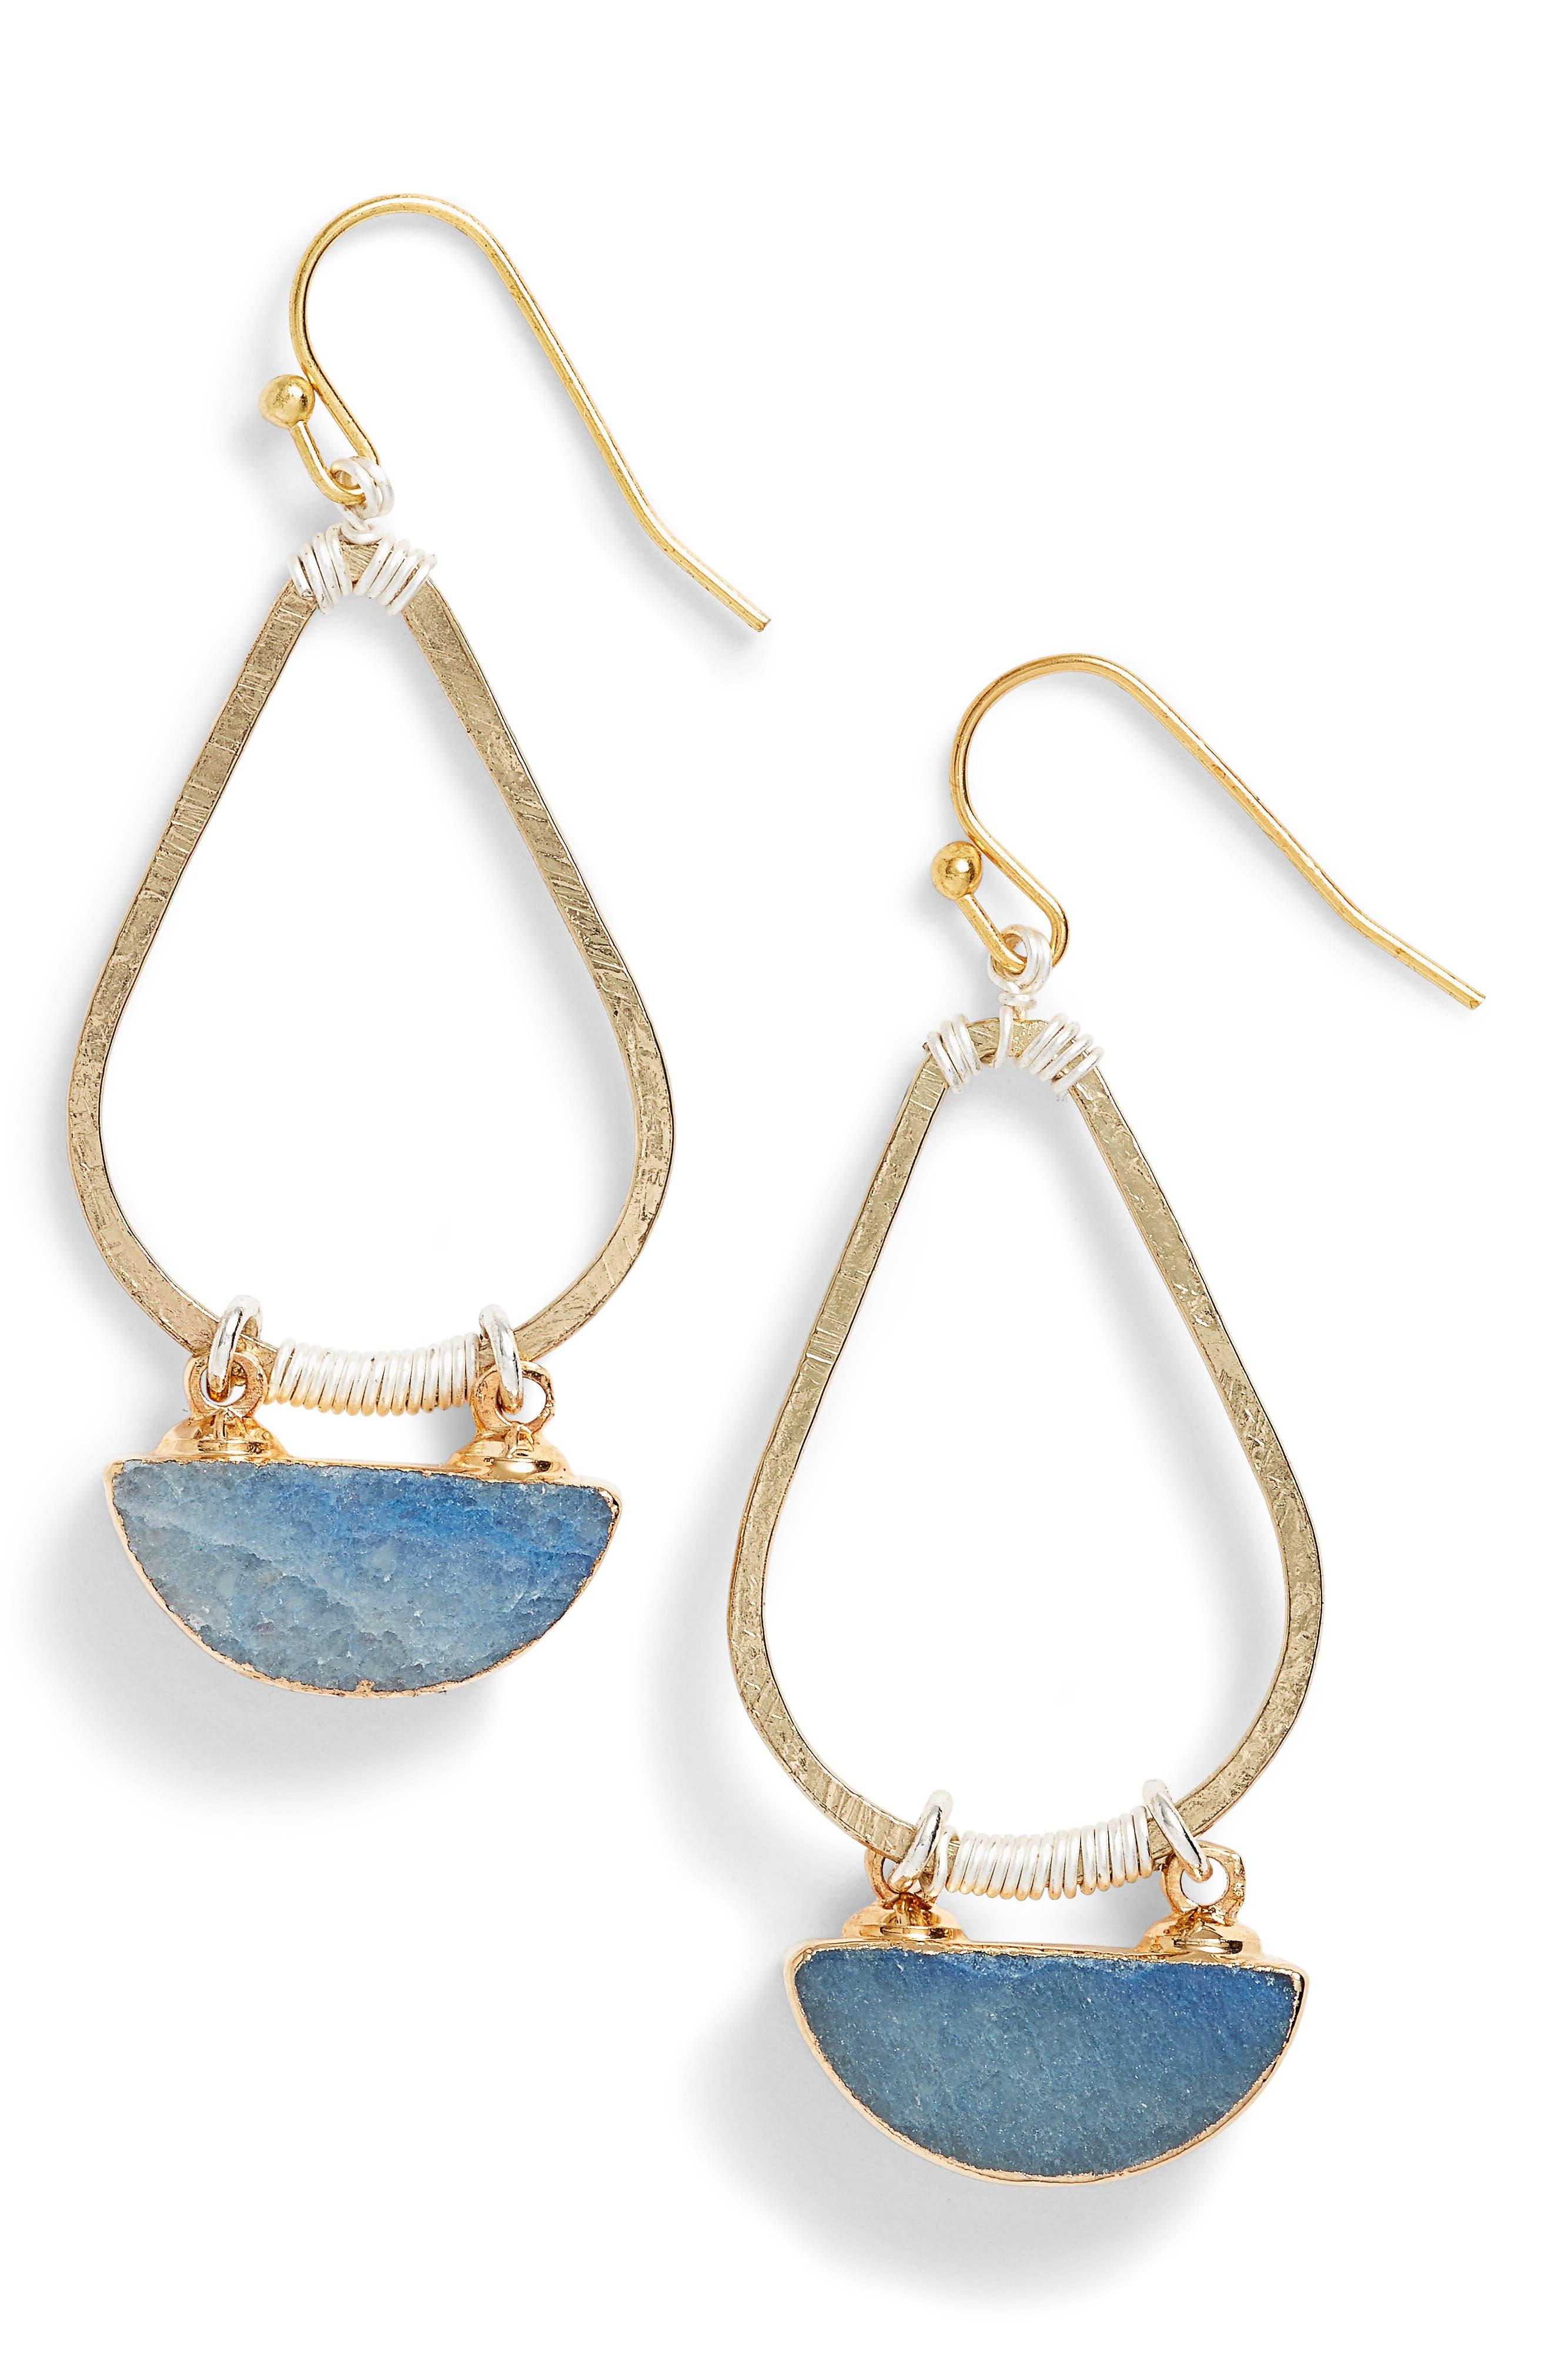 Bahar Lapis Teardrop Earrings,                         Main,                         color, 400